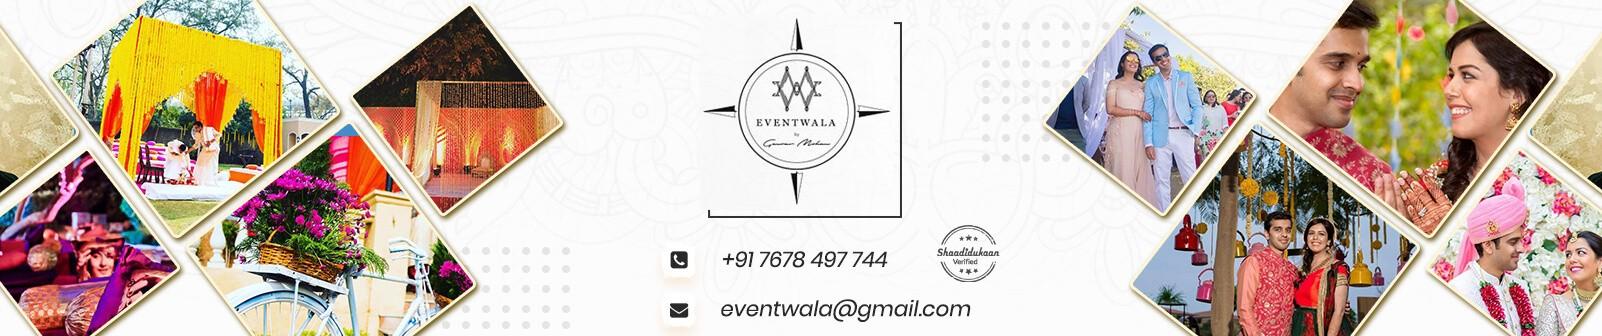 eventwala-by-gaurav-mohan-3